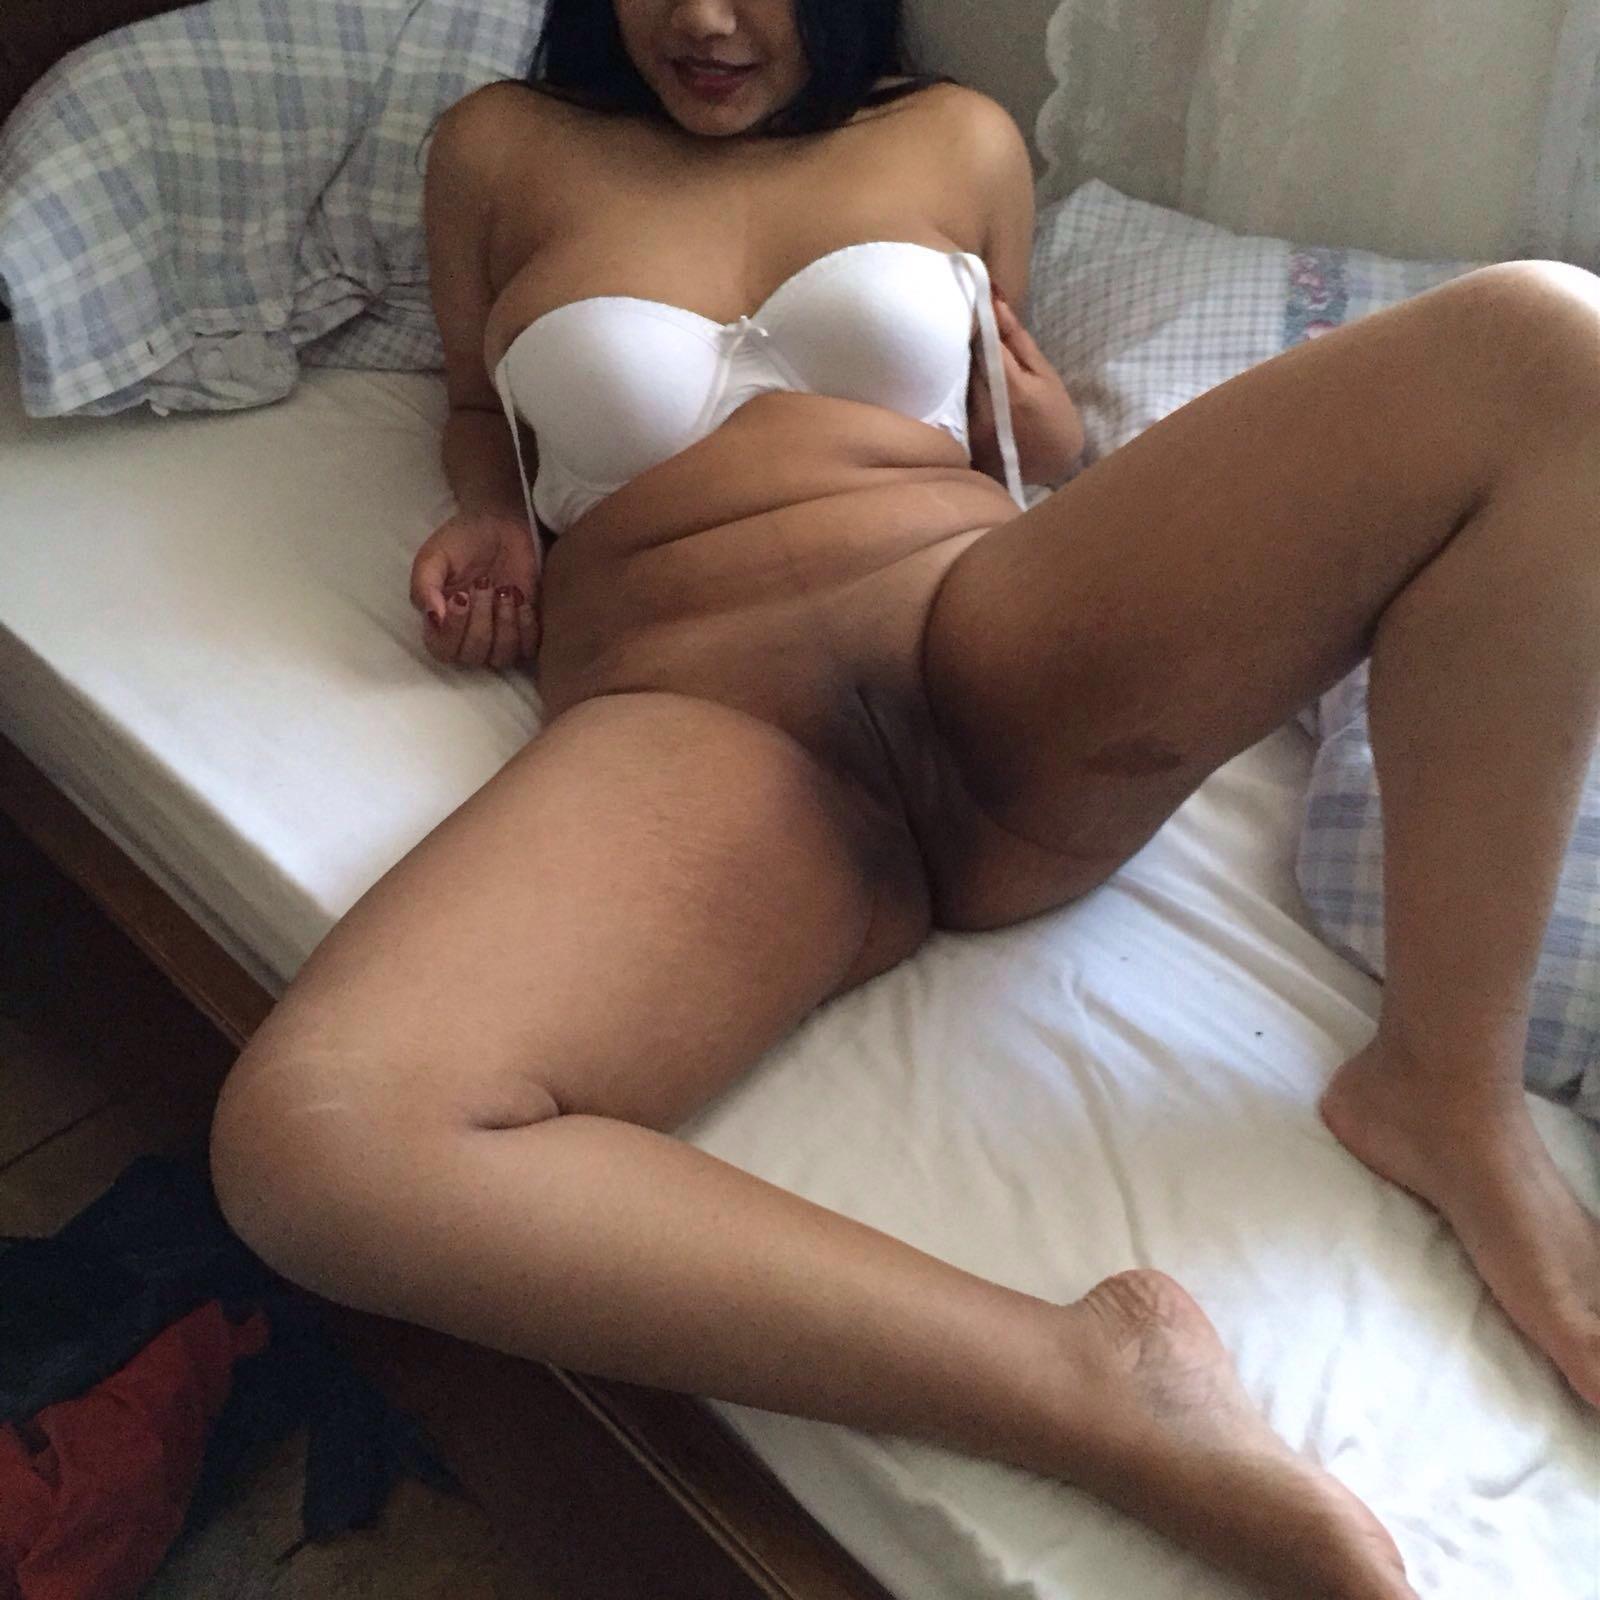 Srilanka sinhala girl anal fuck - 1 part 8